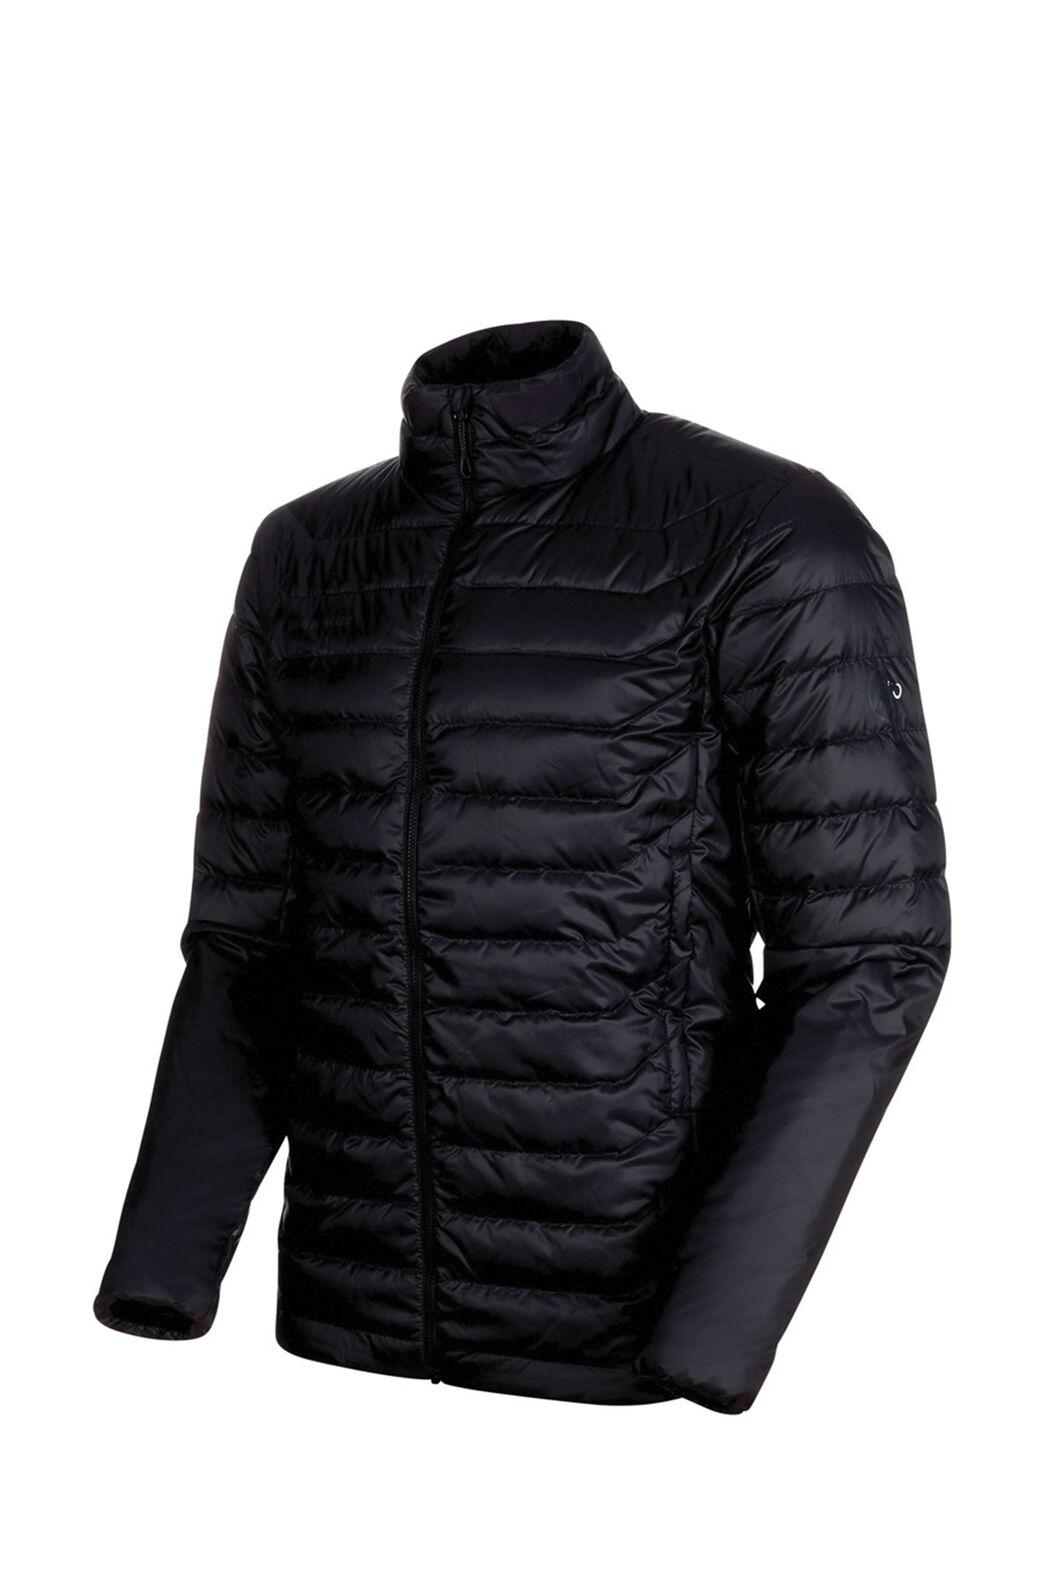 Mammut Convey 3 in 1 Hooded Hardshell Jacket - Men's, Black/Black, hi-res